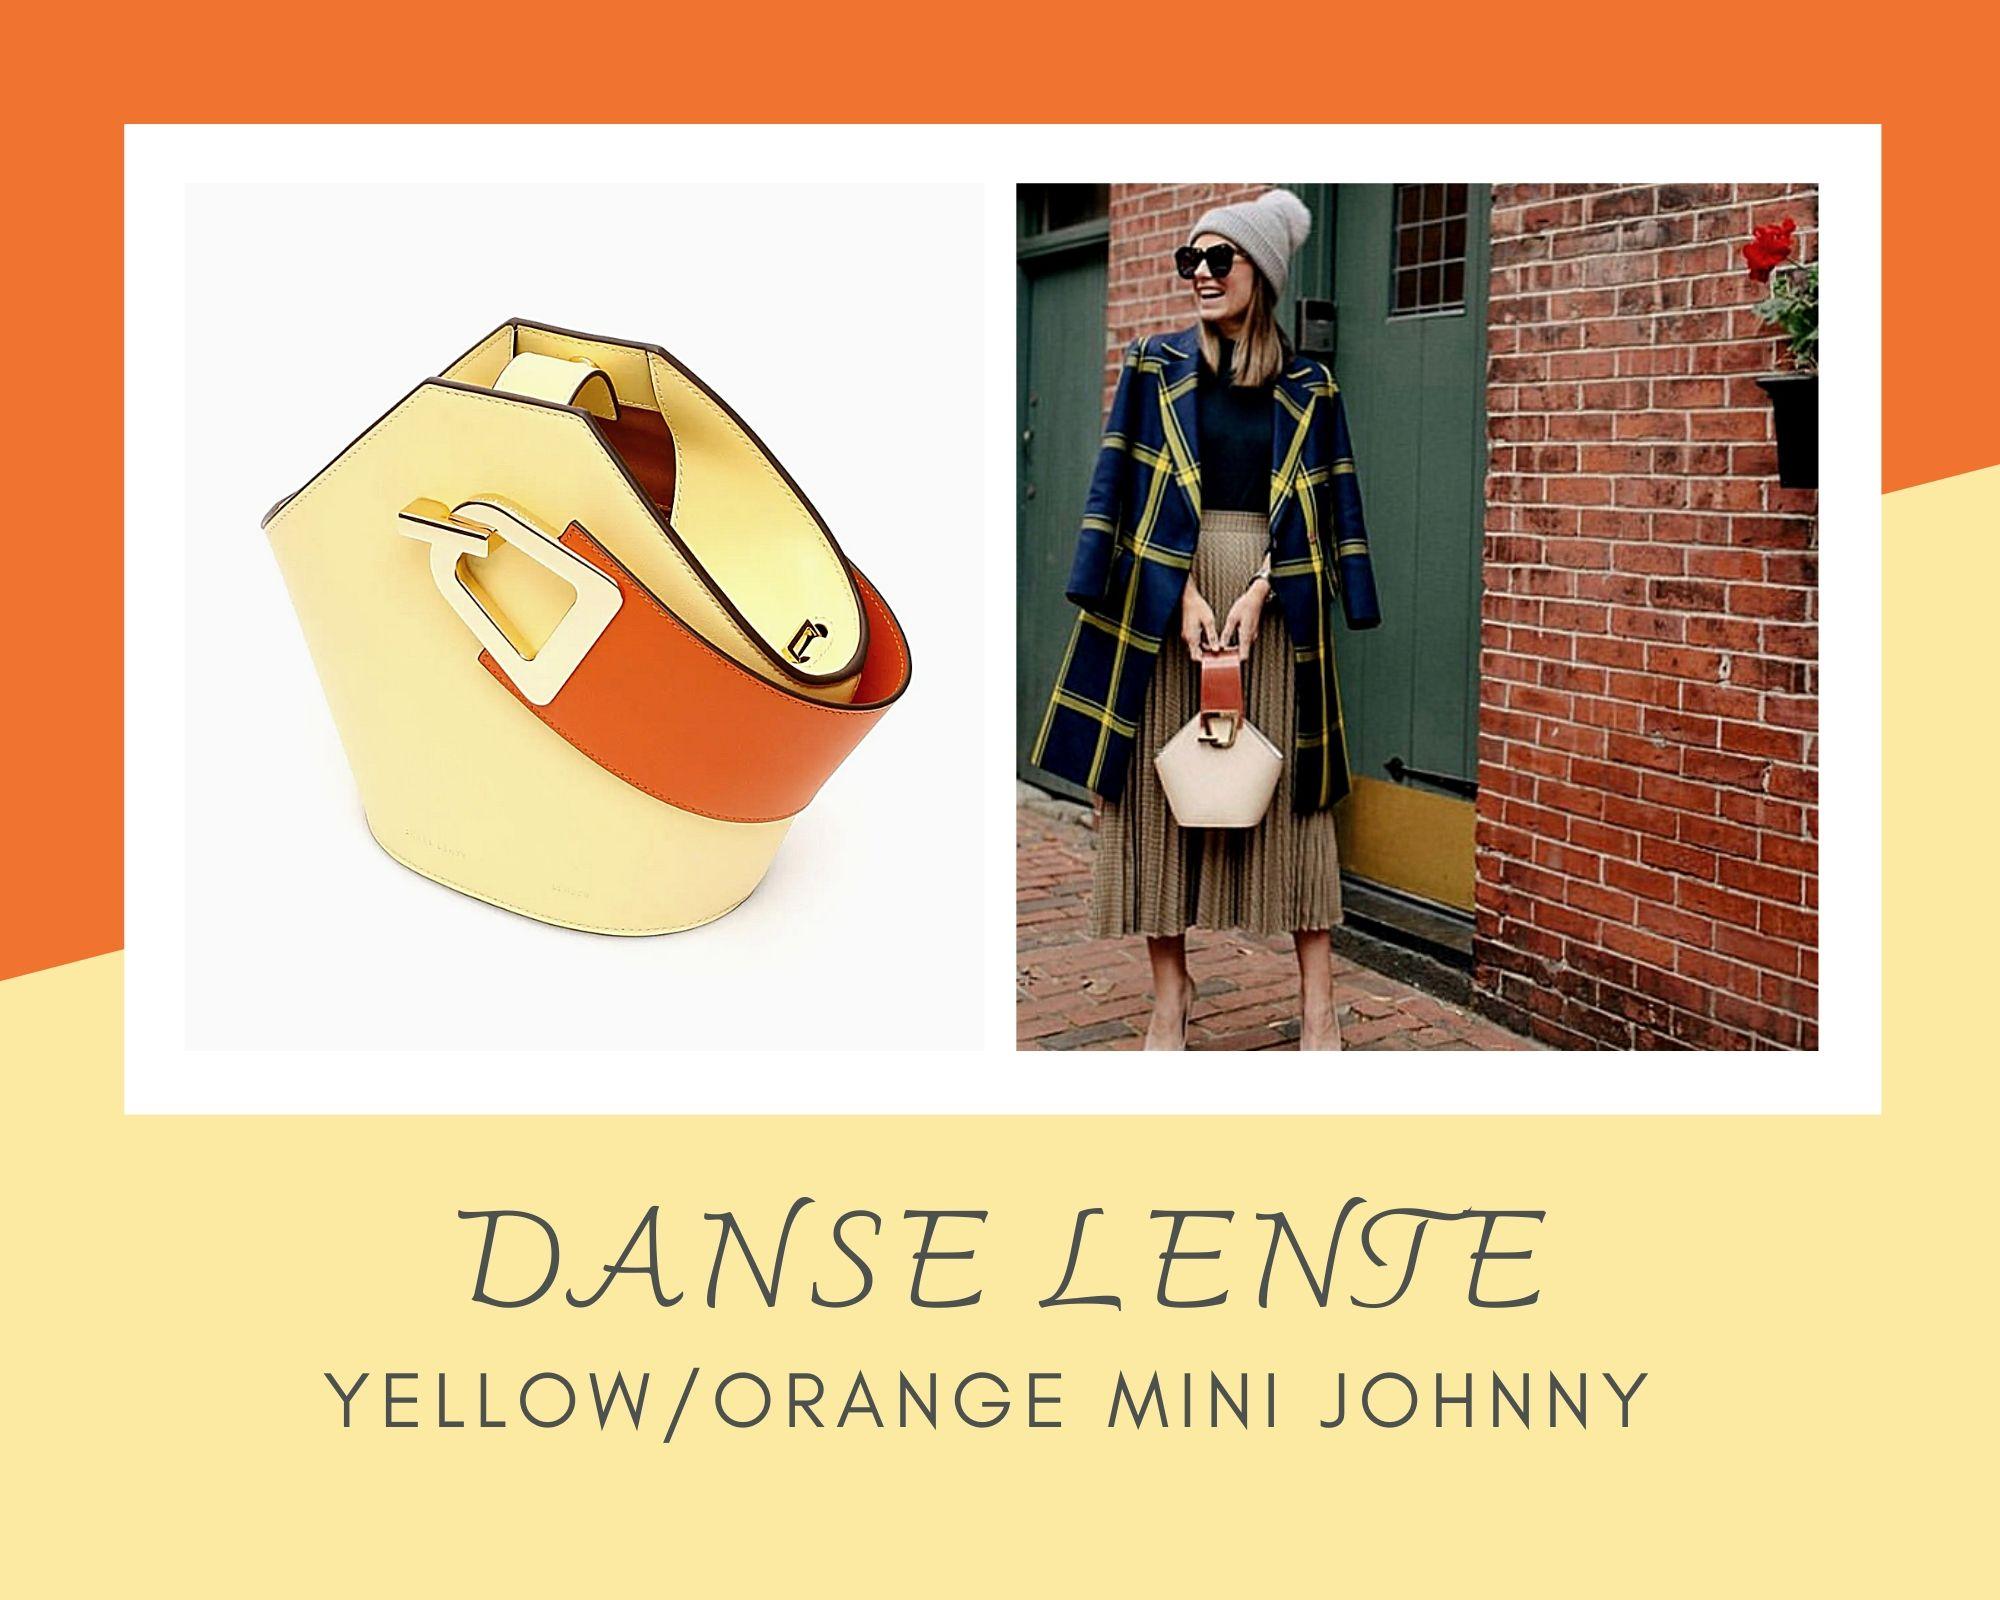 Danse Lente柠檬黄✖火橘色撞色水桶美包